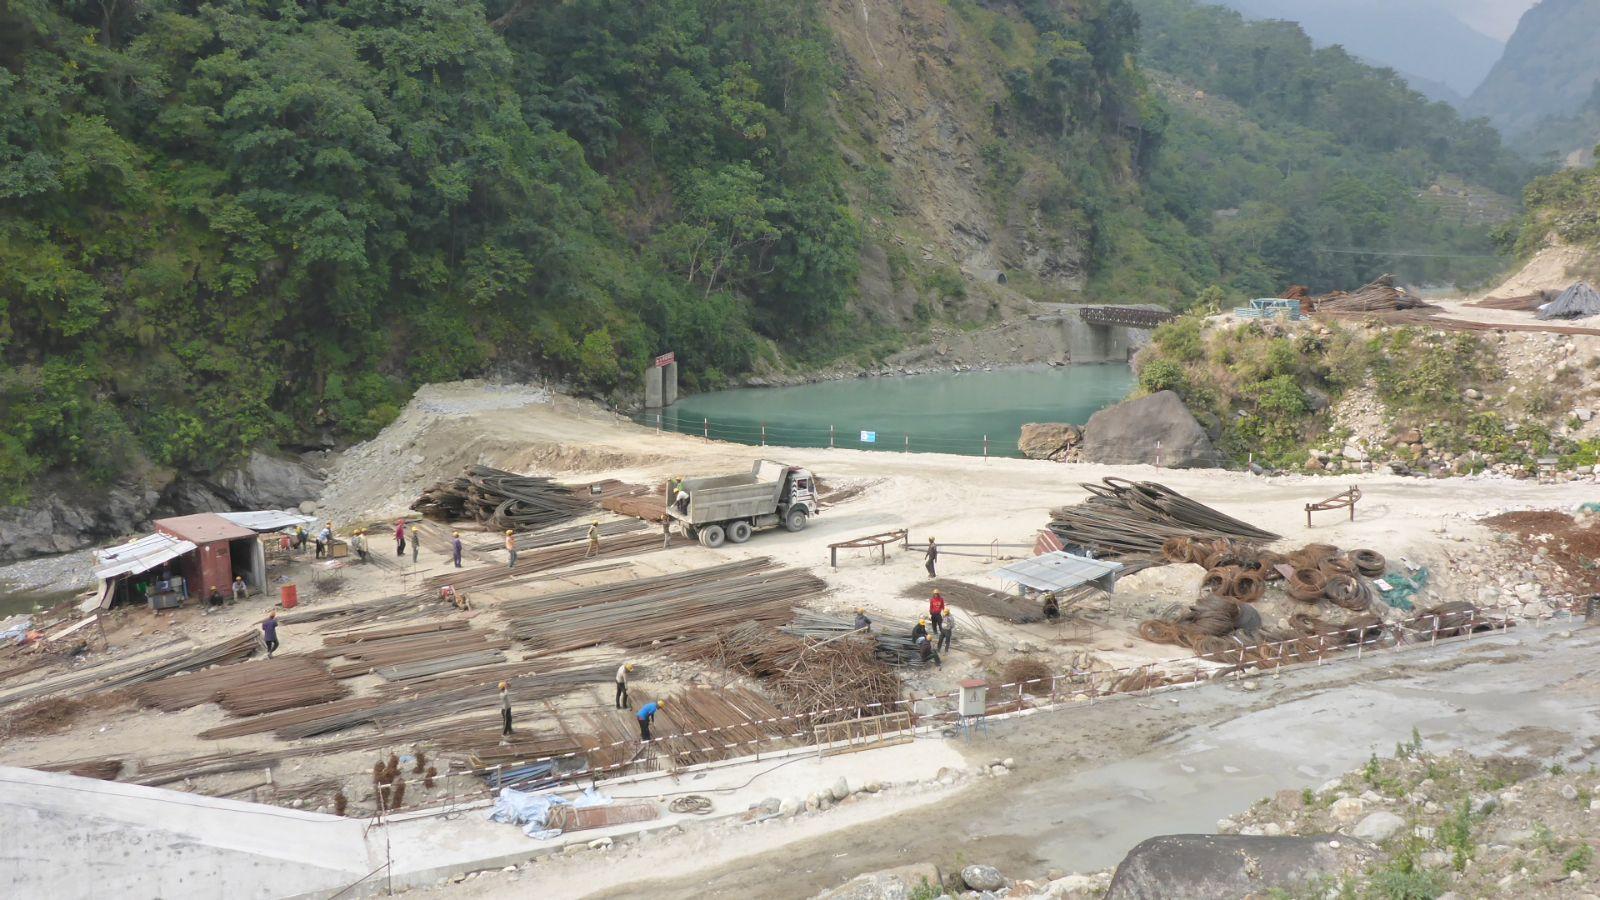 Annapurna Circuit Start - zunächst verschandelte Natur